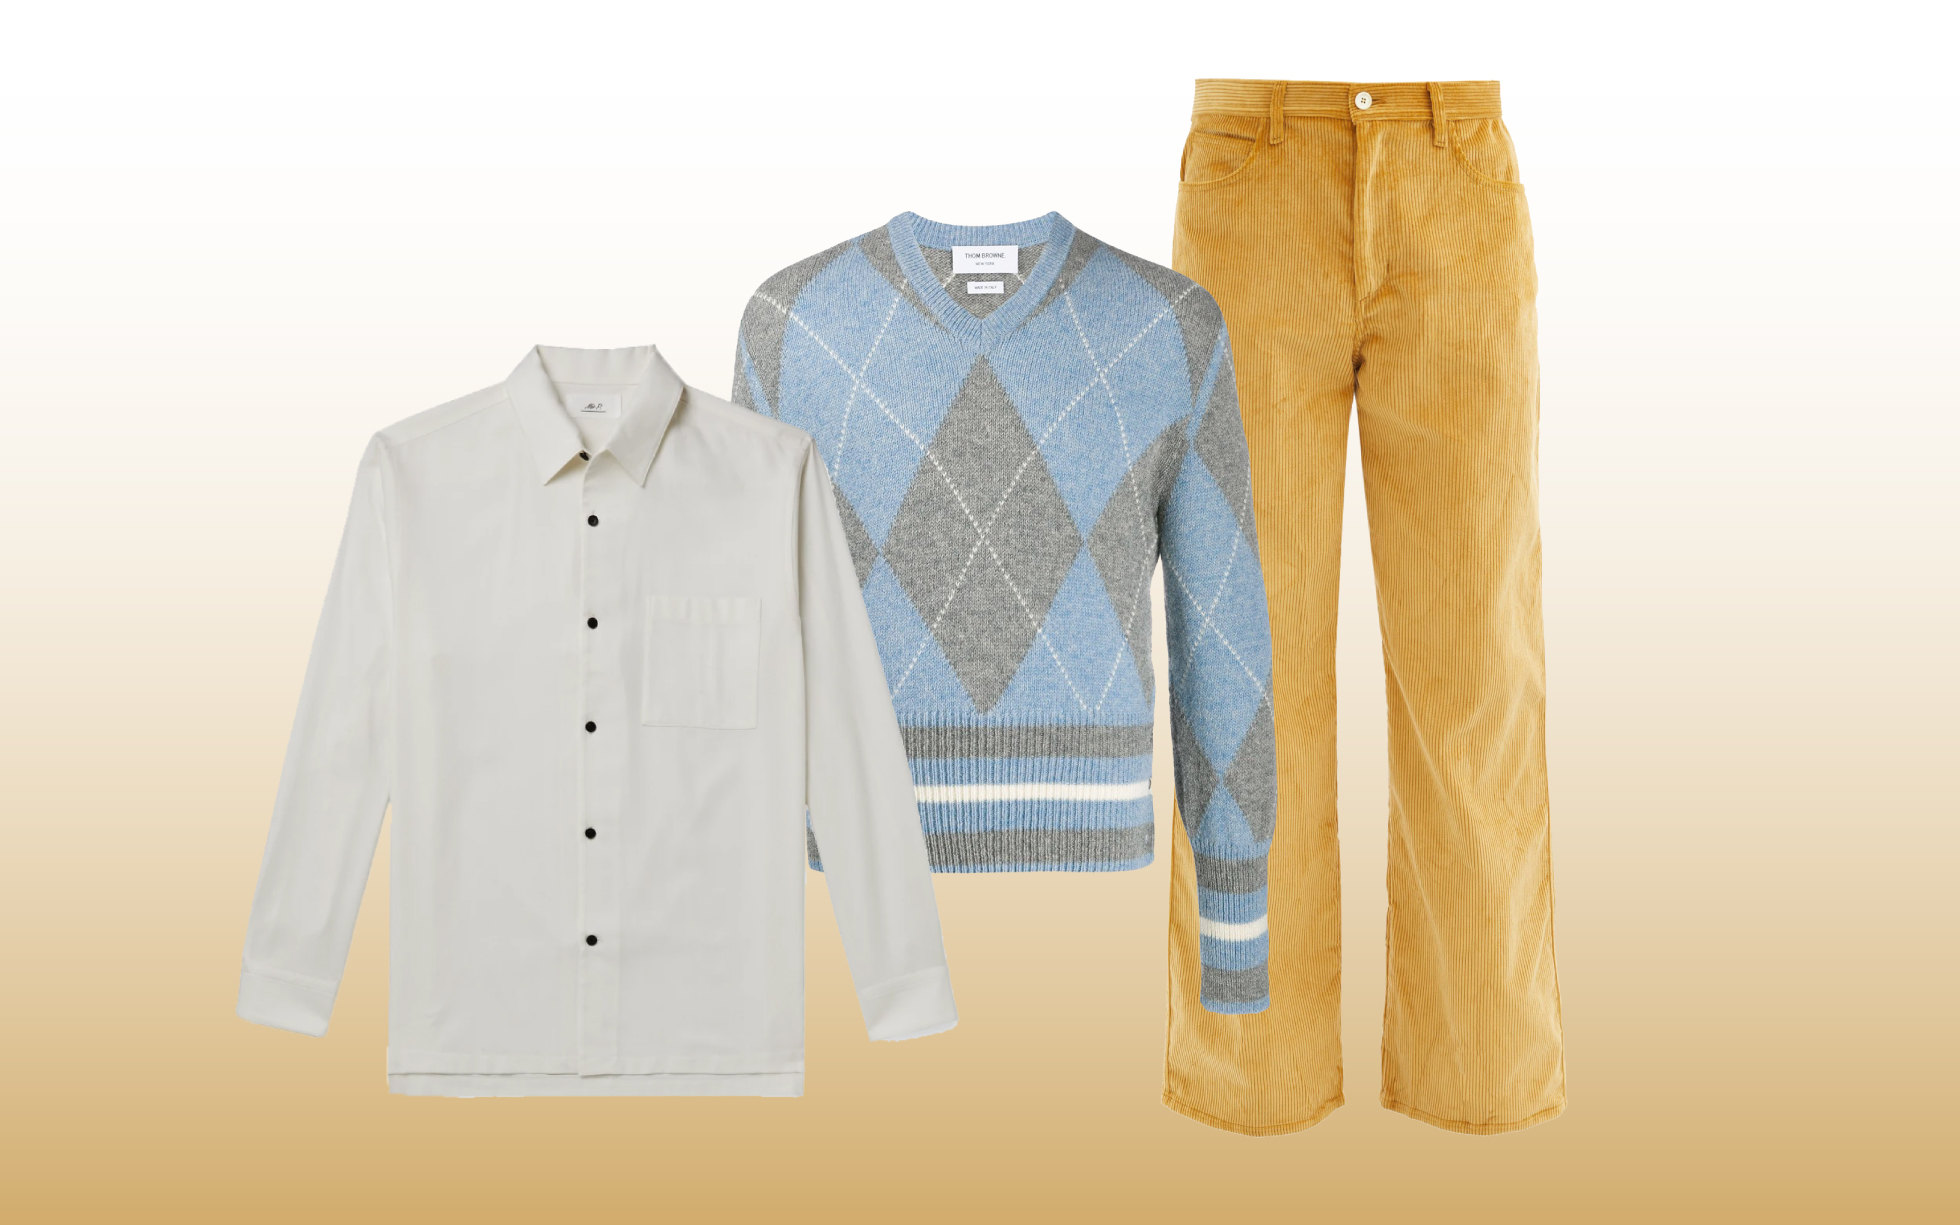 Брюки Marni, €378; рубашка Mr P., $515; джемпер Thom Browne, 85 400 руб.